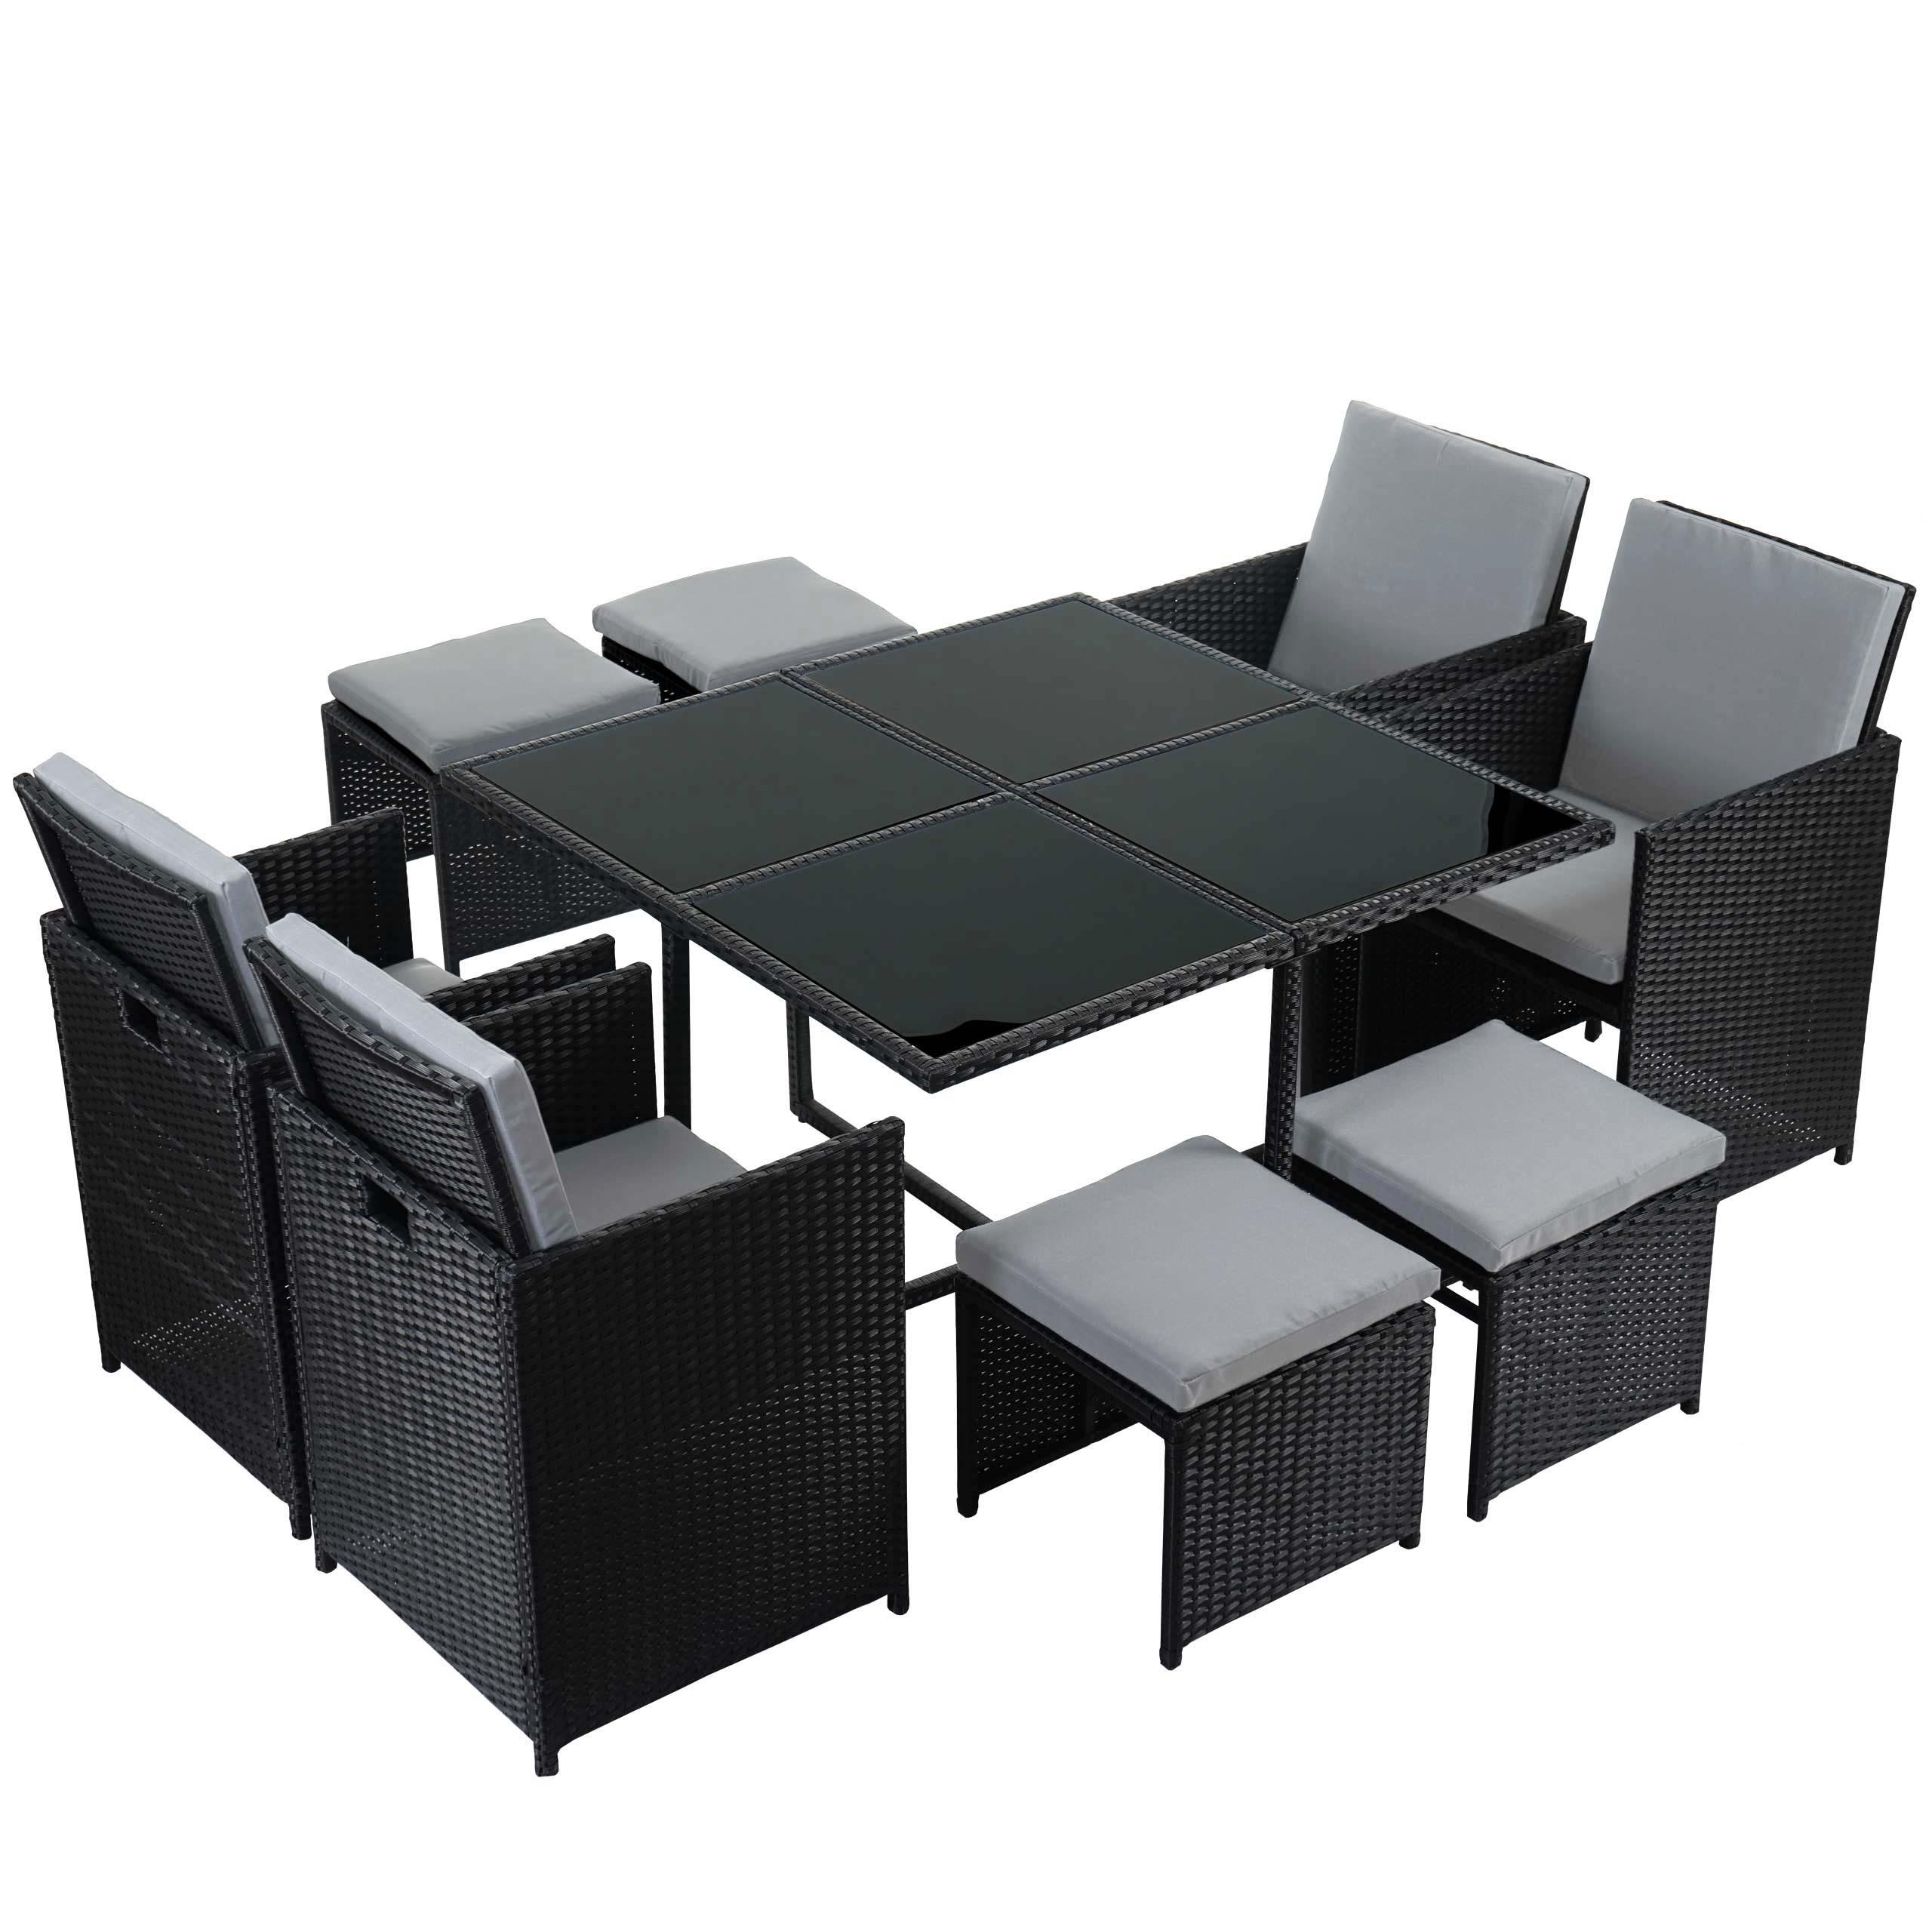 poly rattan garten garnitur kreta lounge set sitzgruppe 4 st hle schwarz kissen hellgrau. Black Bedroom Furniture Sets. Home Design Ideas